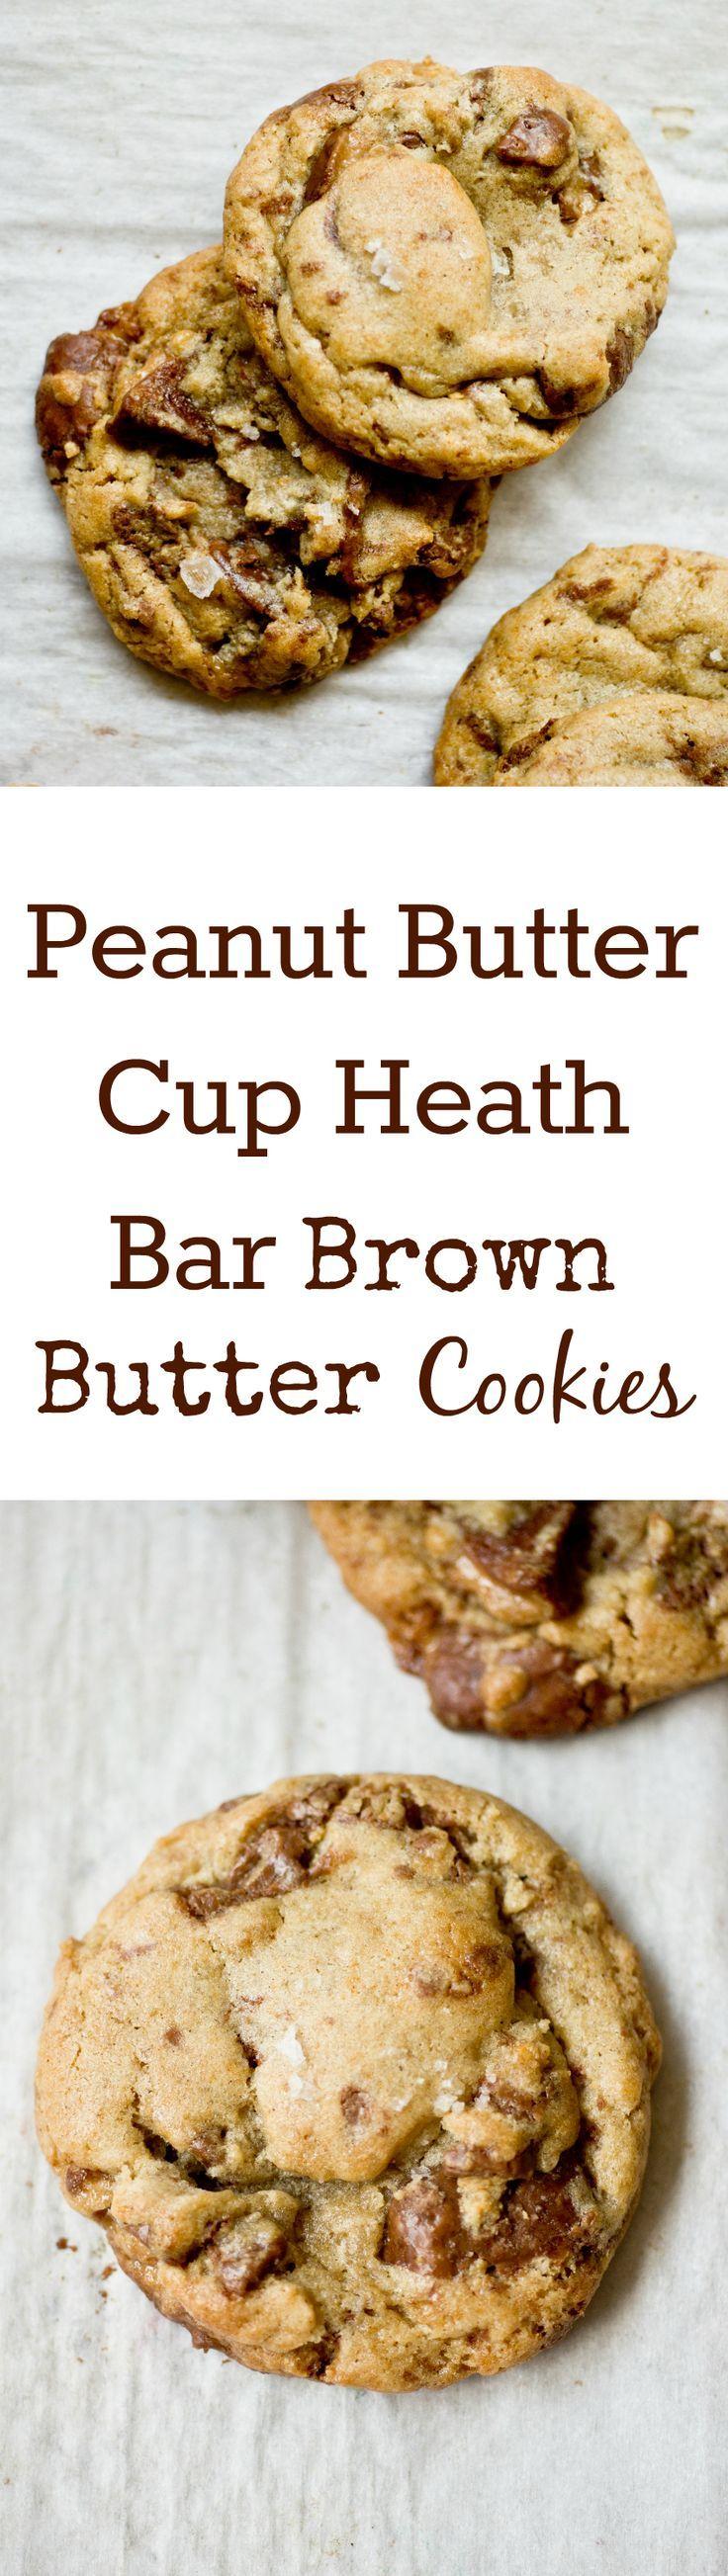 Amazing Peanut Butter Cup Heath Bar Brown Butter Cookies